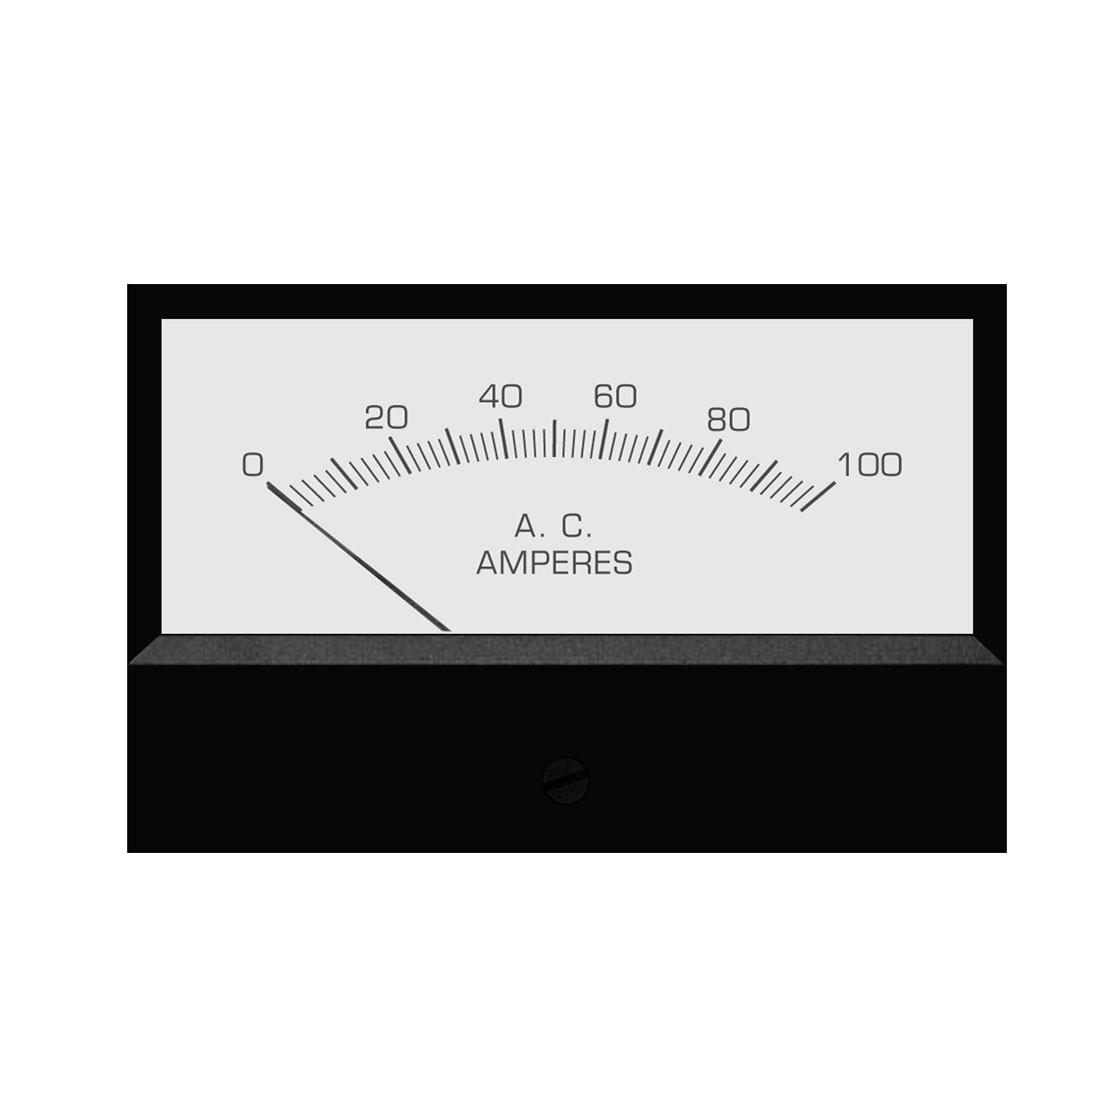 2146 AC Analog Panel Meter - Front View